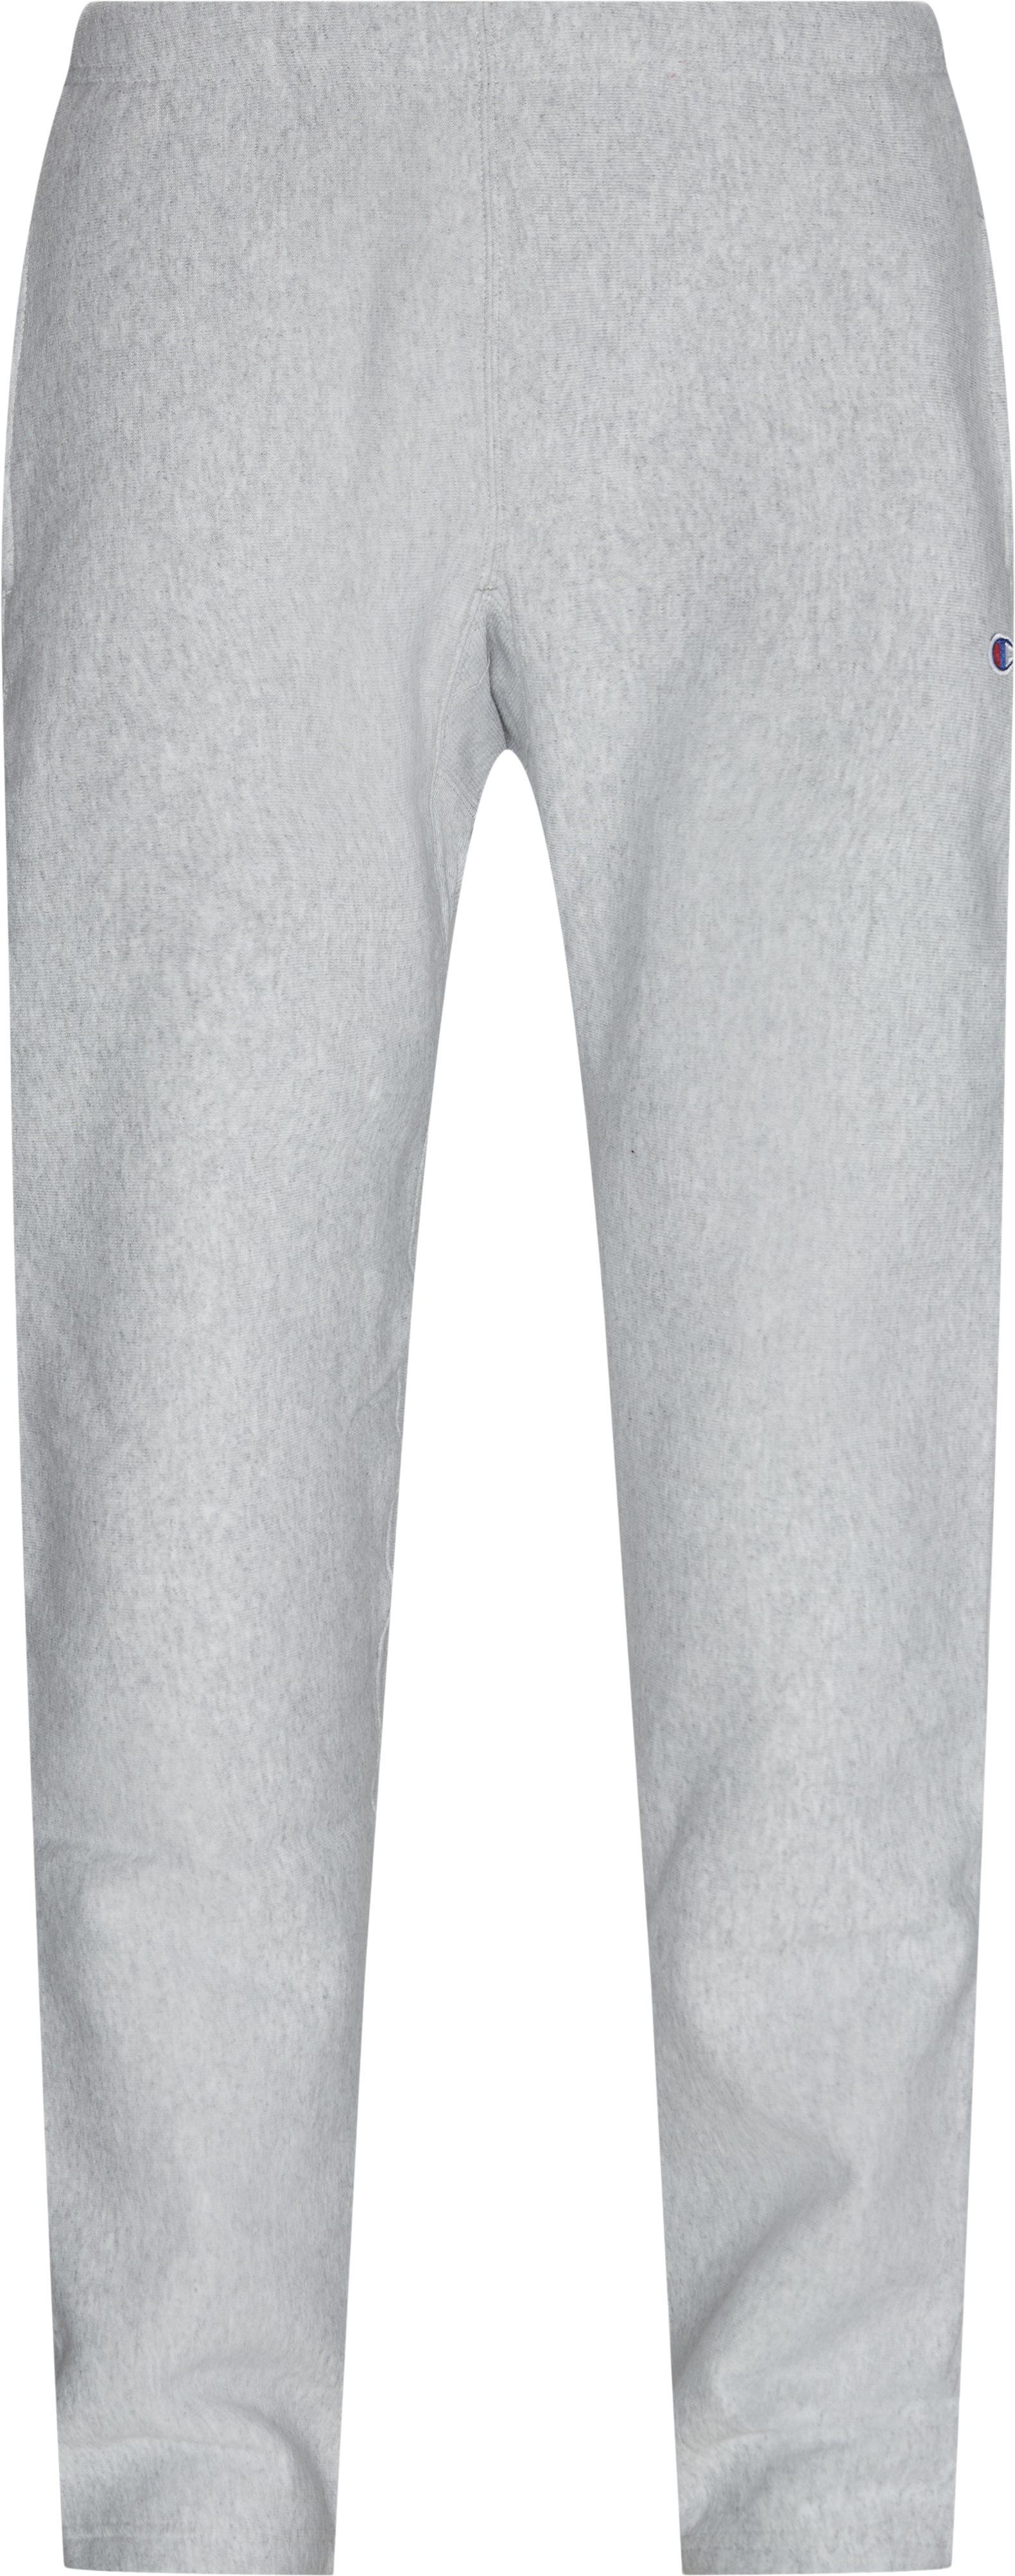 Champion Sweatpants - Bukser - Regular fit - Grå